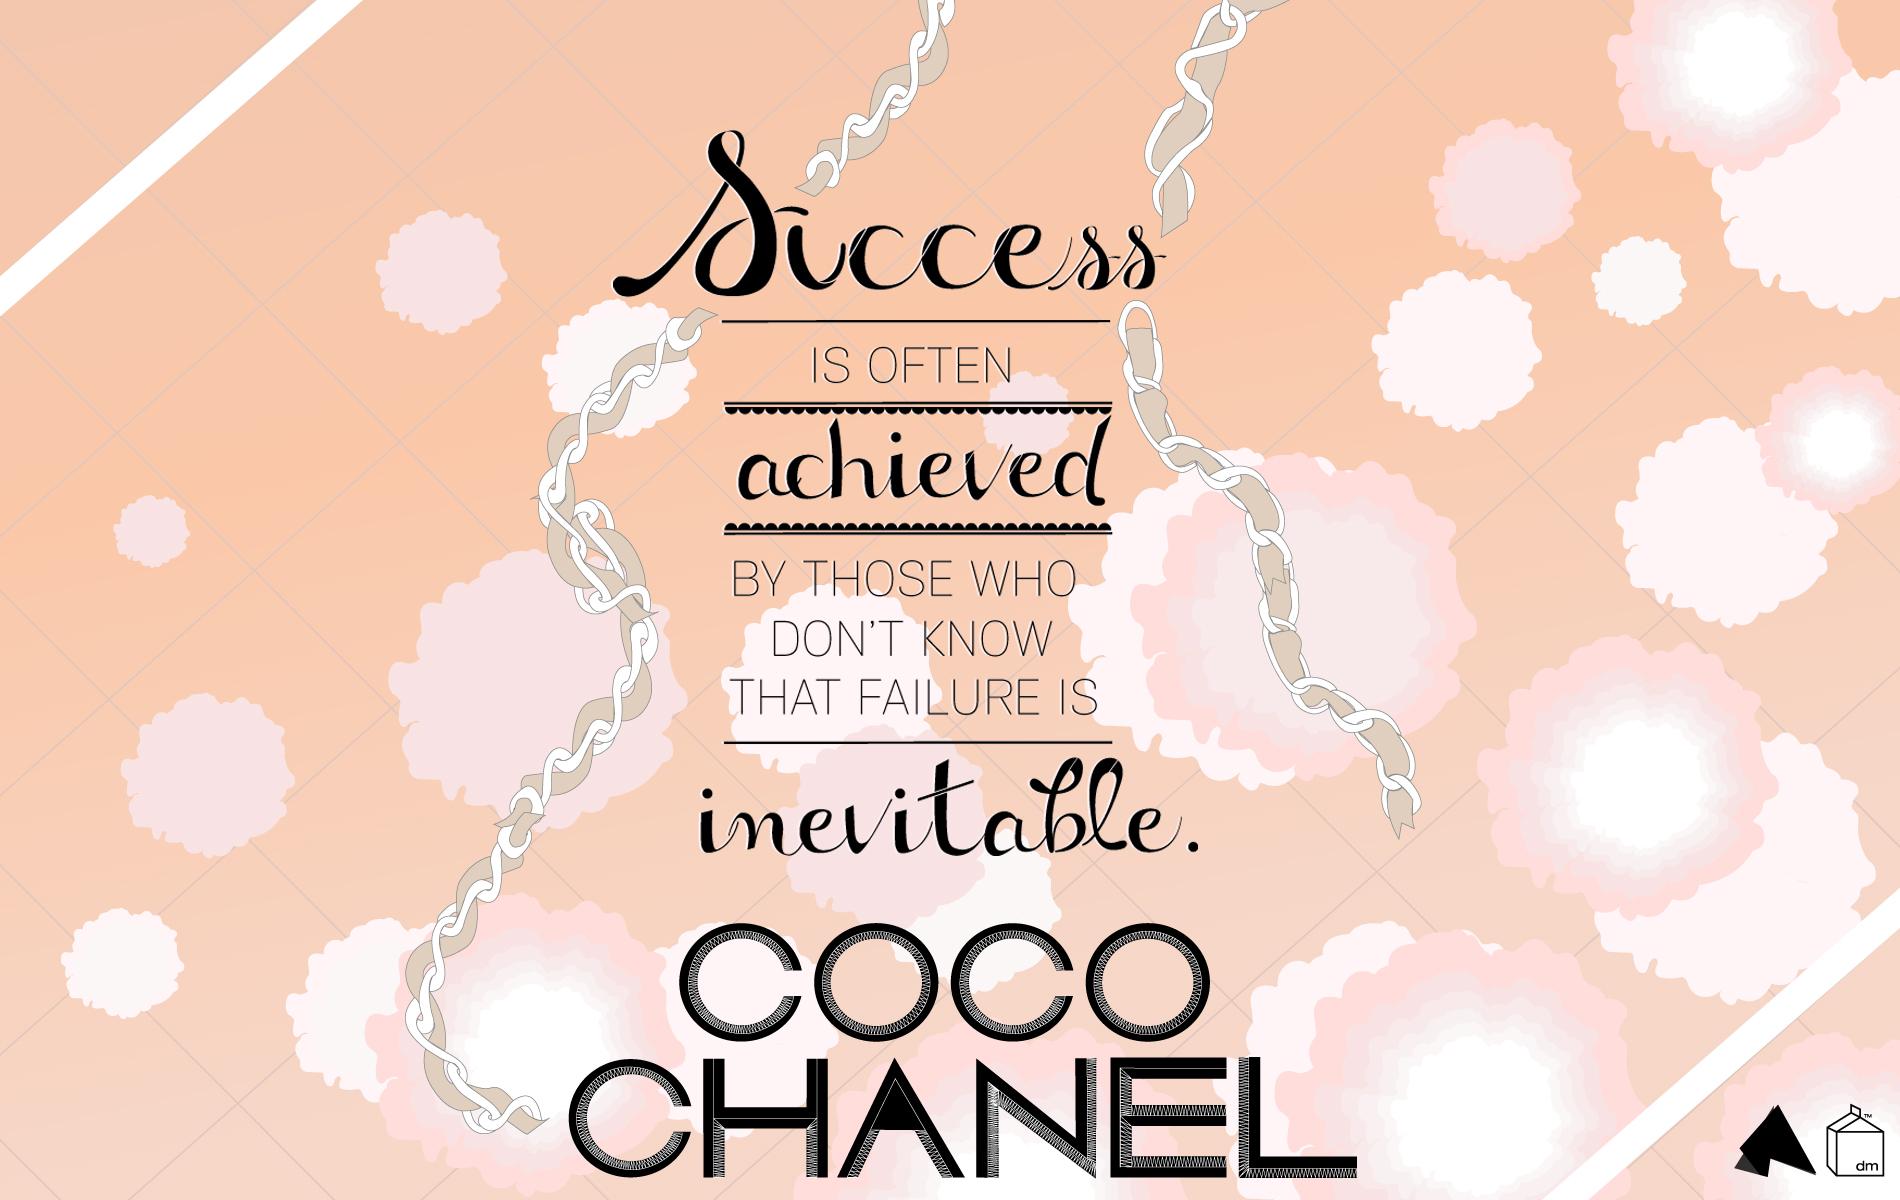 coco chanel iphone wallpaper wallpapersafari